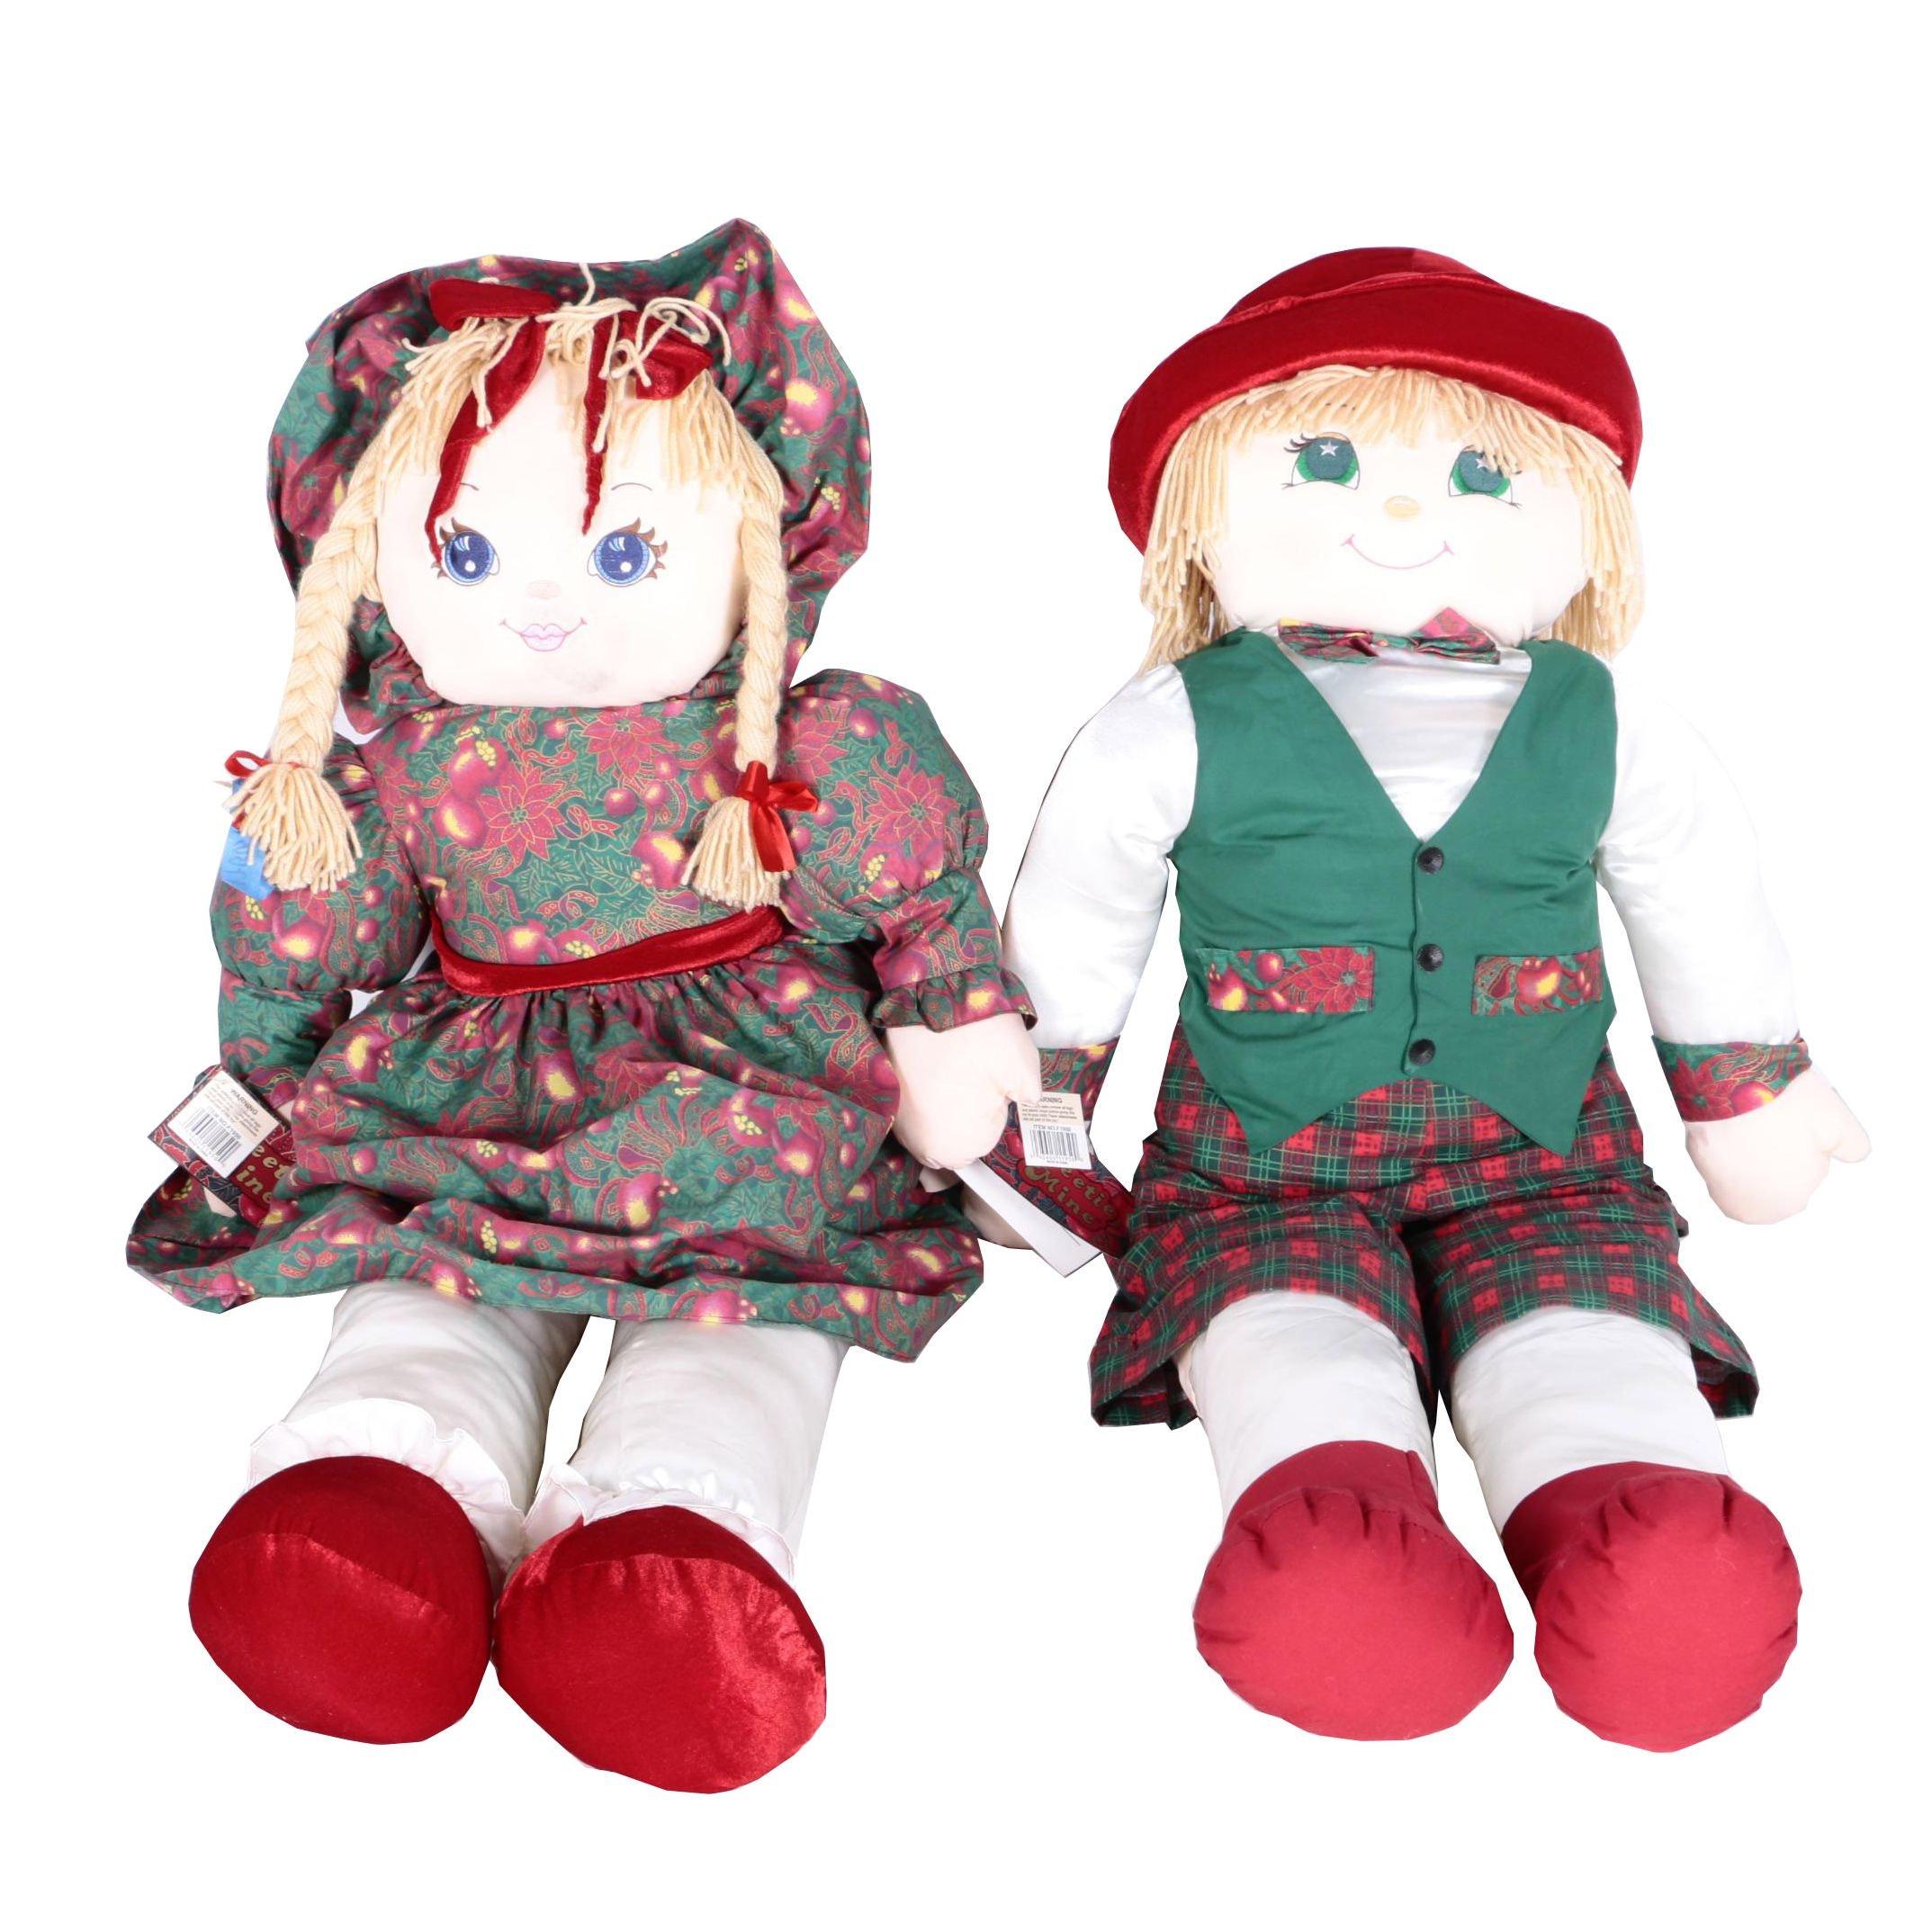 1995 Sweetie Mine Christmas Dolls